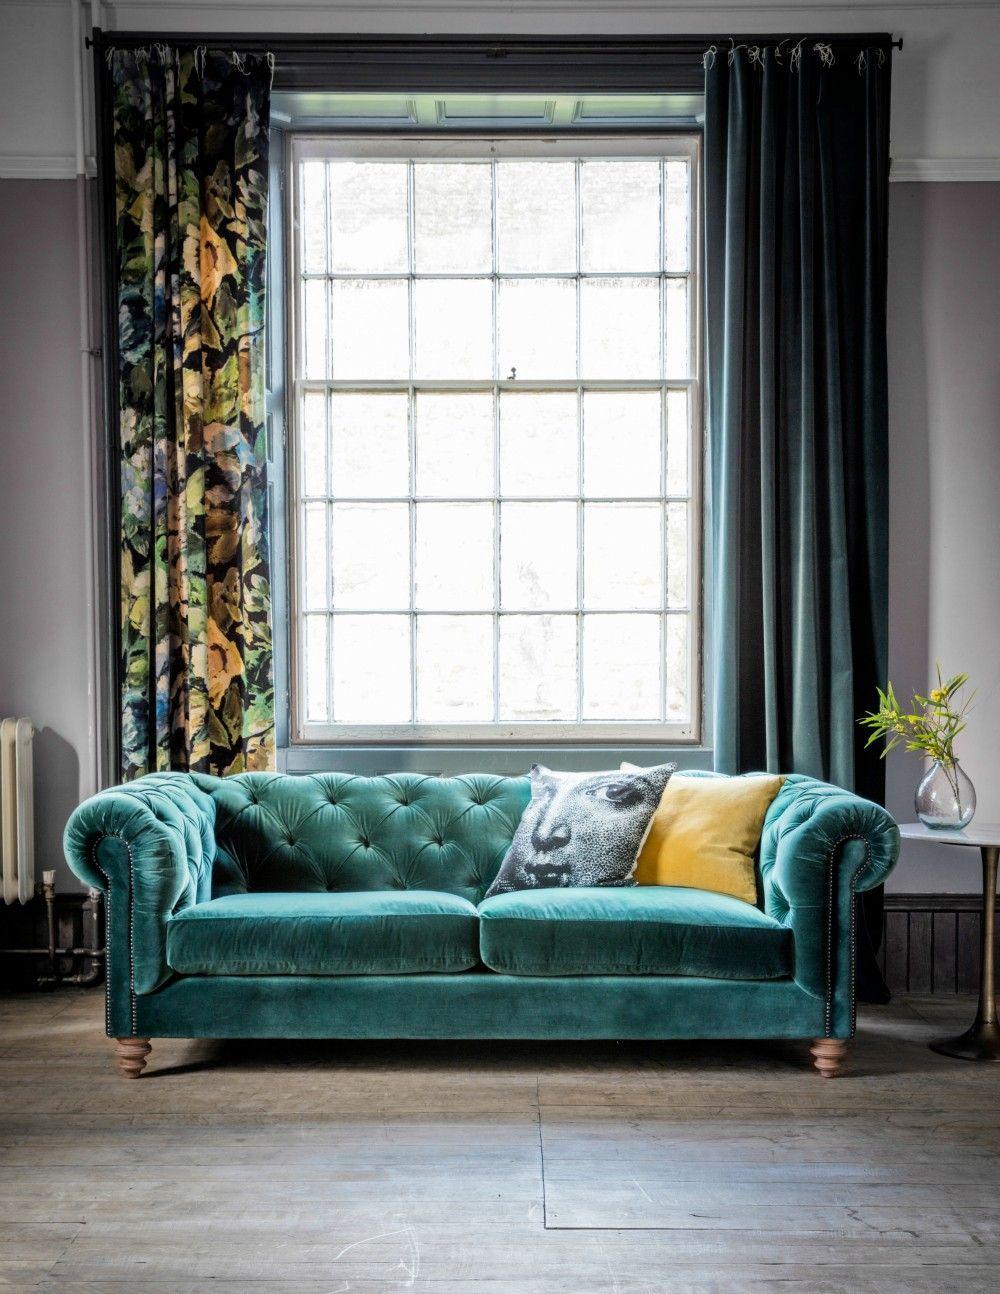 e2199b4bd11 www.roseandgrey.co.uk velvet-chesterfield-sofa -4-colours-available nosto nosto-page-product1